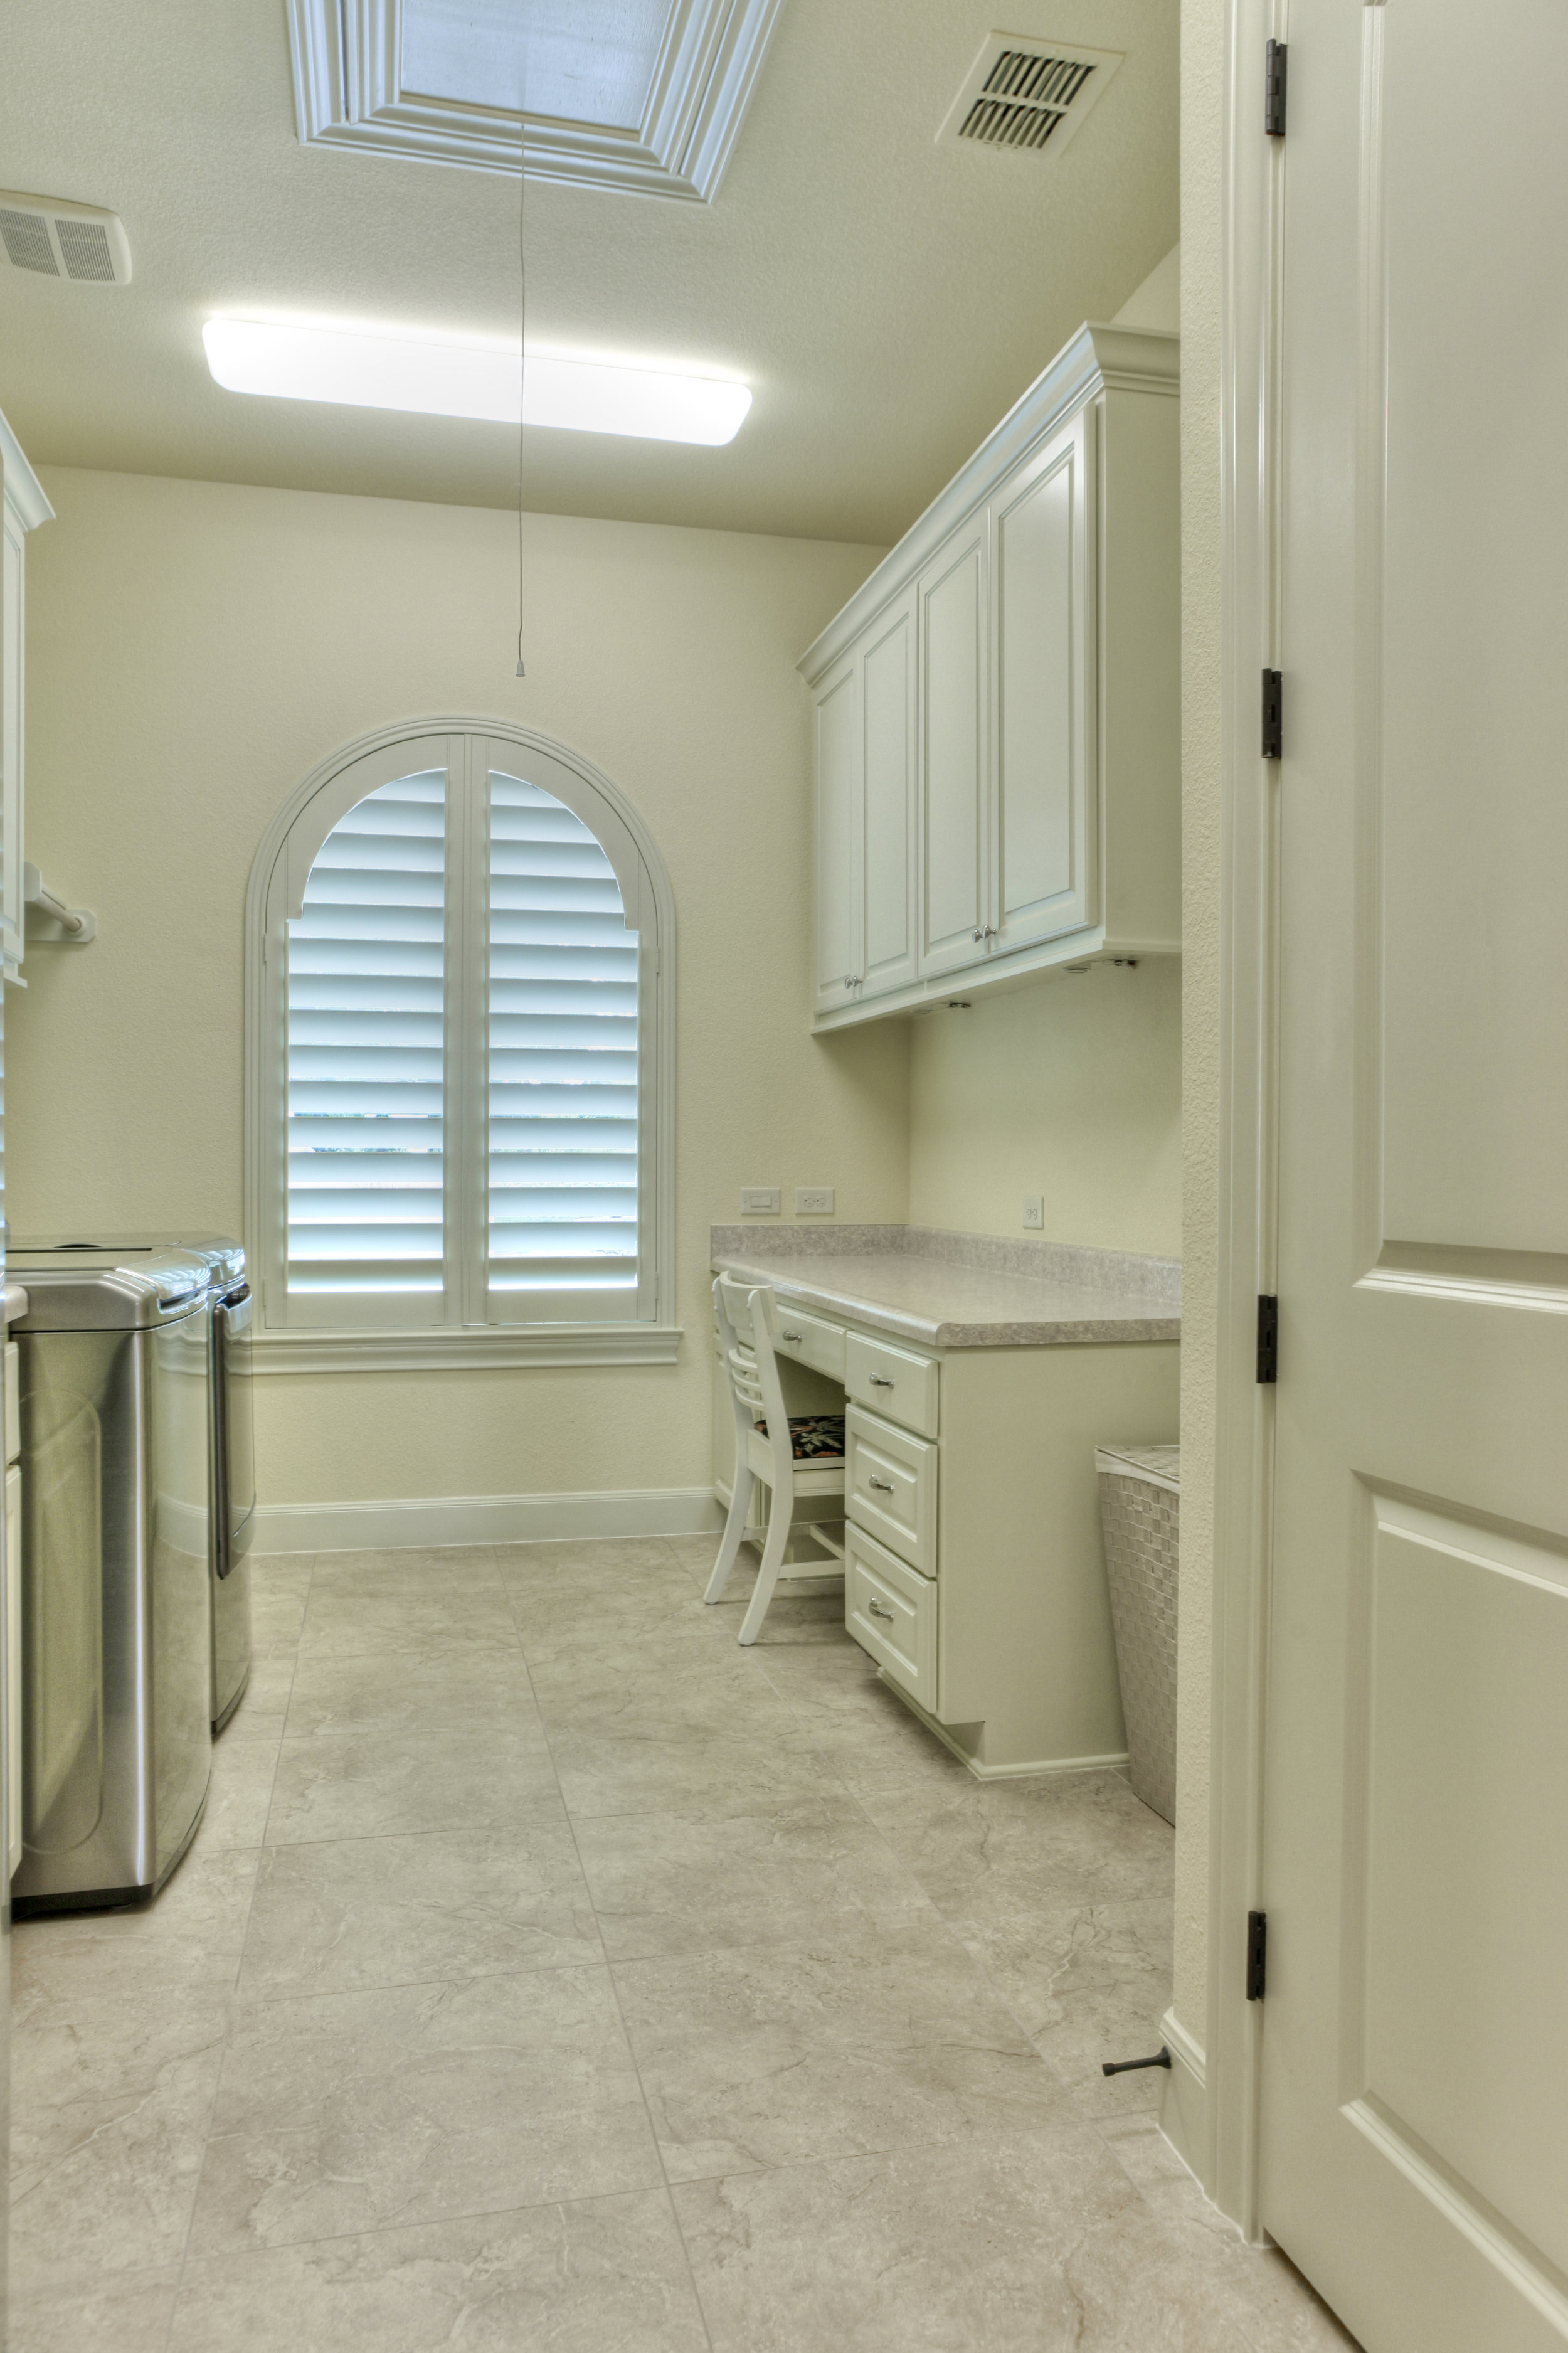 20-utility room 2.jpg